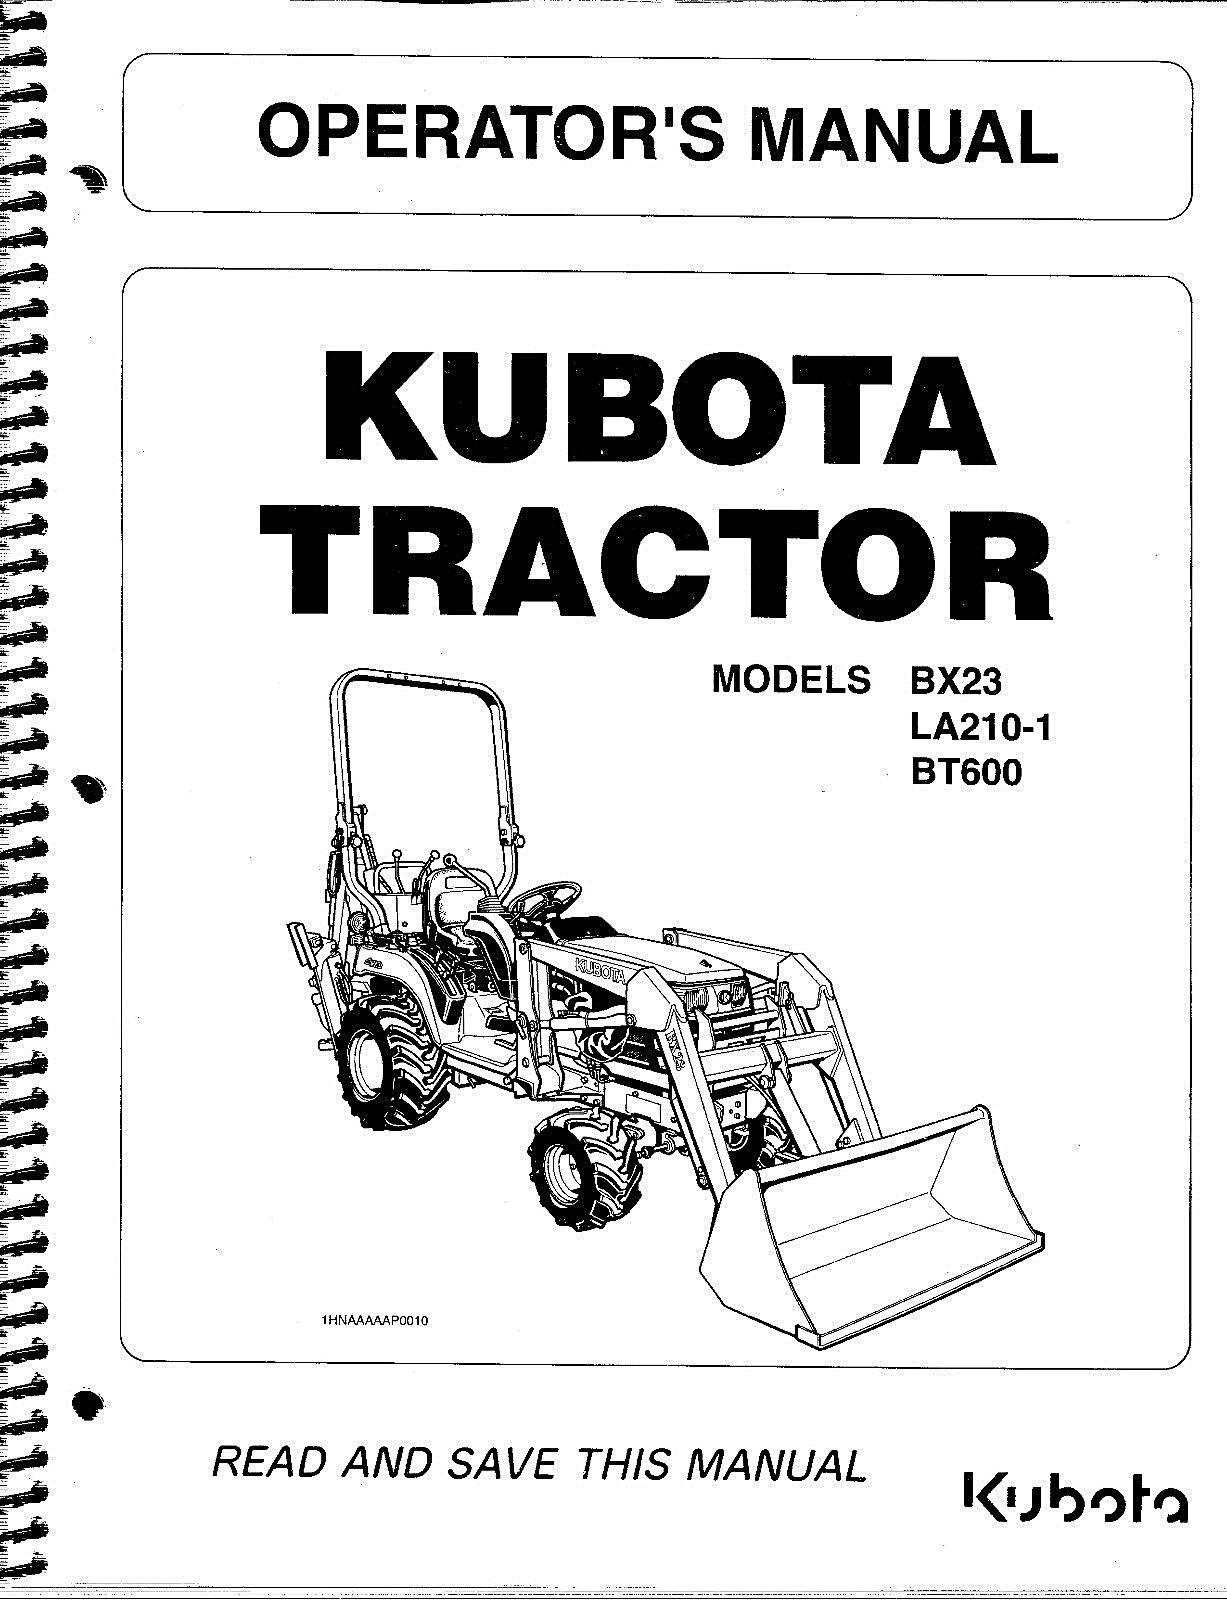 kubota bx23 la210 1 bt600 tractor loader backhoe operator manual ebay rh ebay com kubota bx23 owners manual pdf kubota bx23 service manual pdf